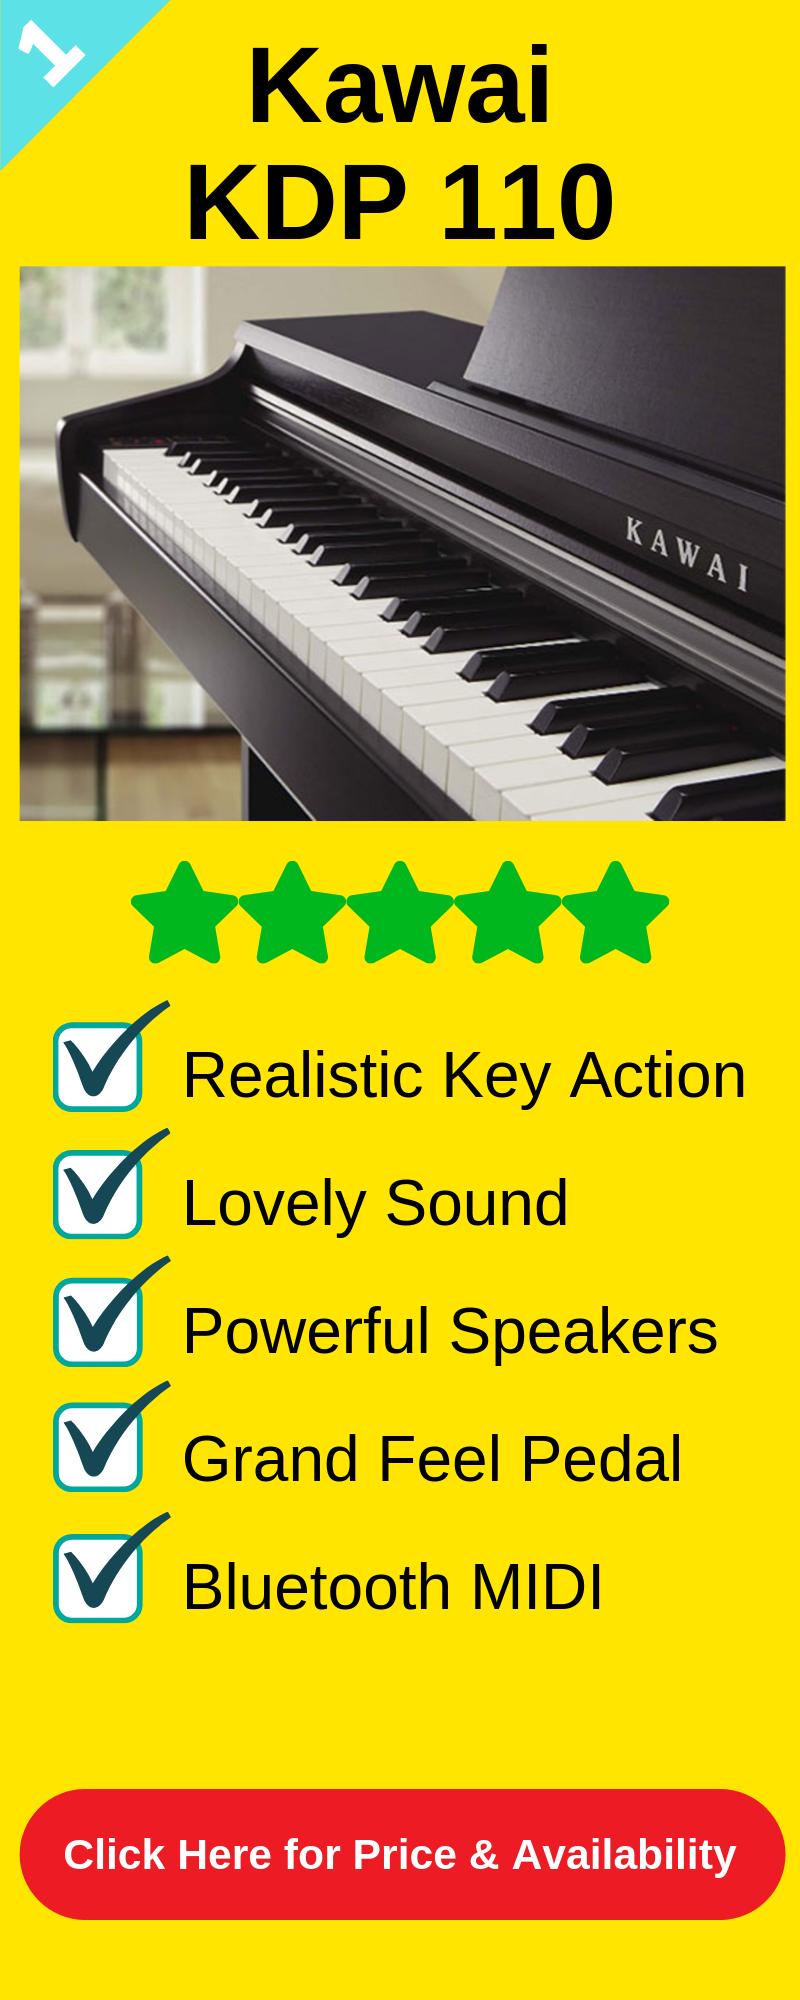 The best digital piano under 1000 is the Kawai KDP 110